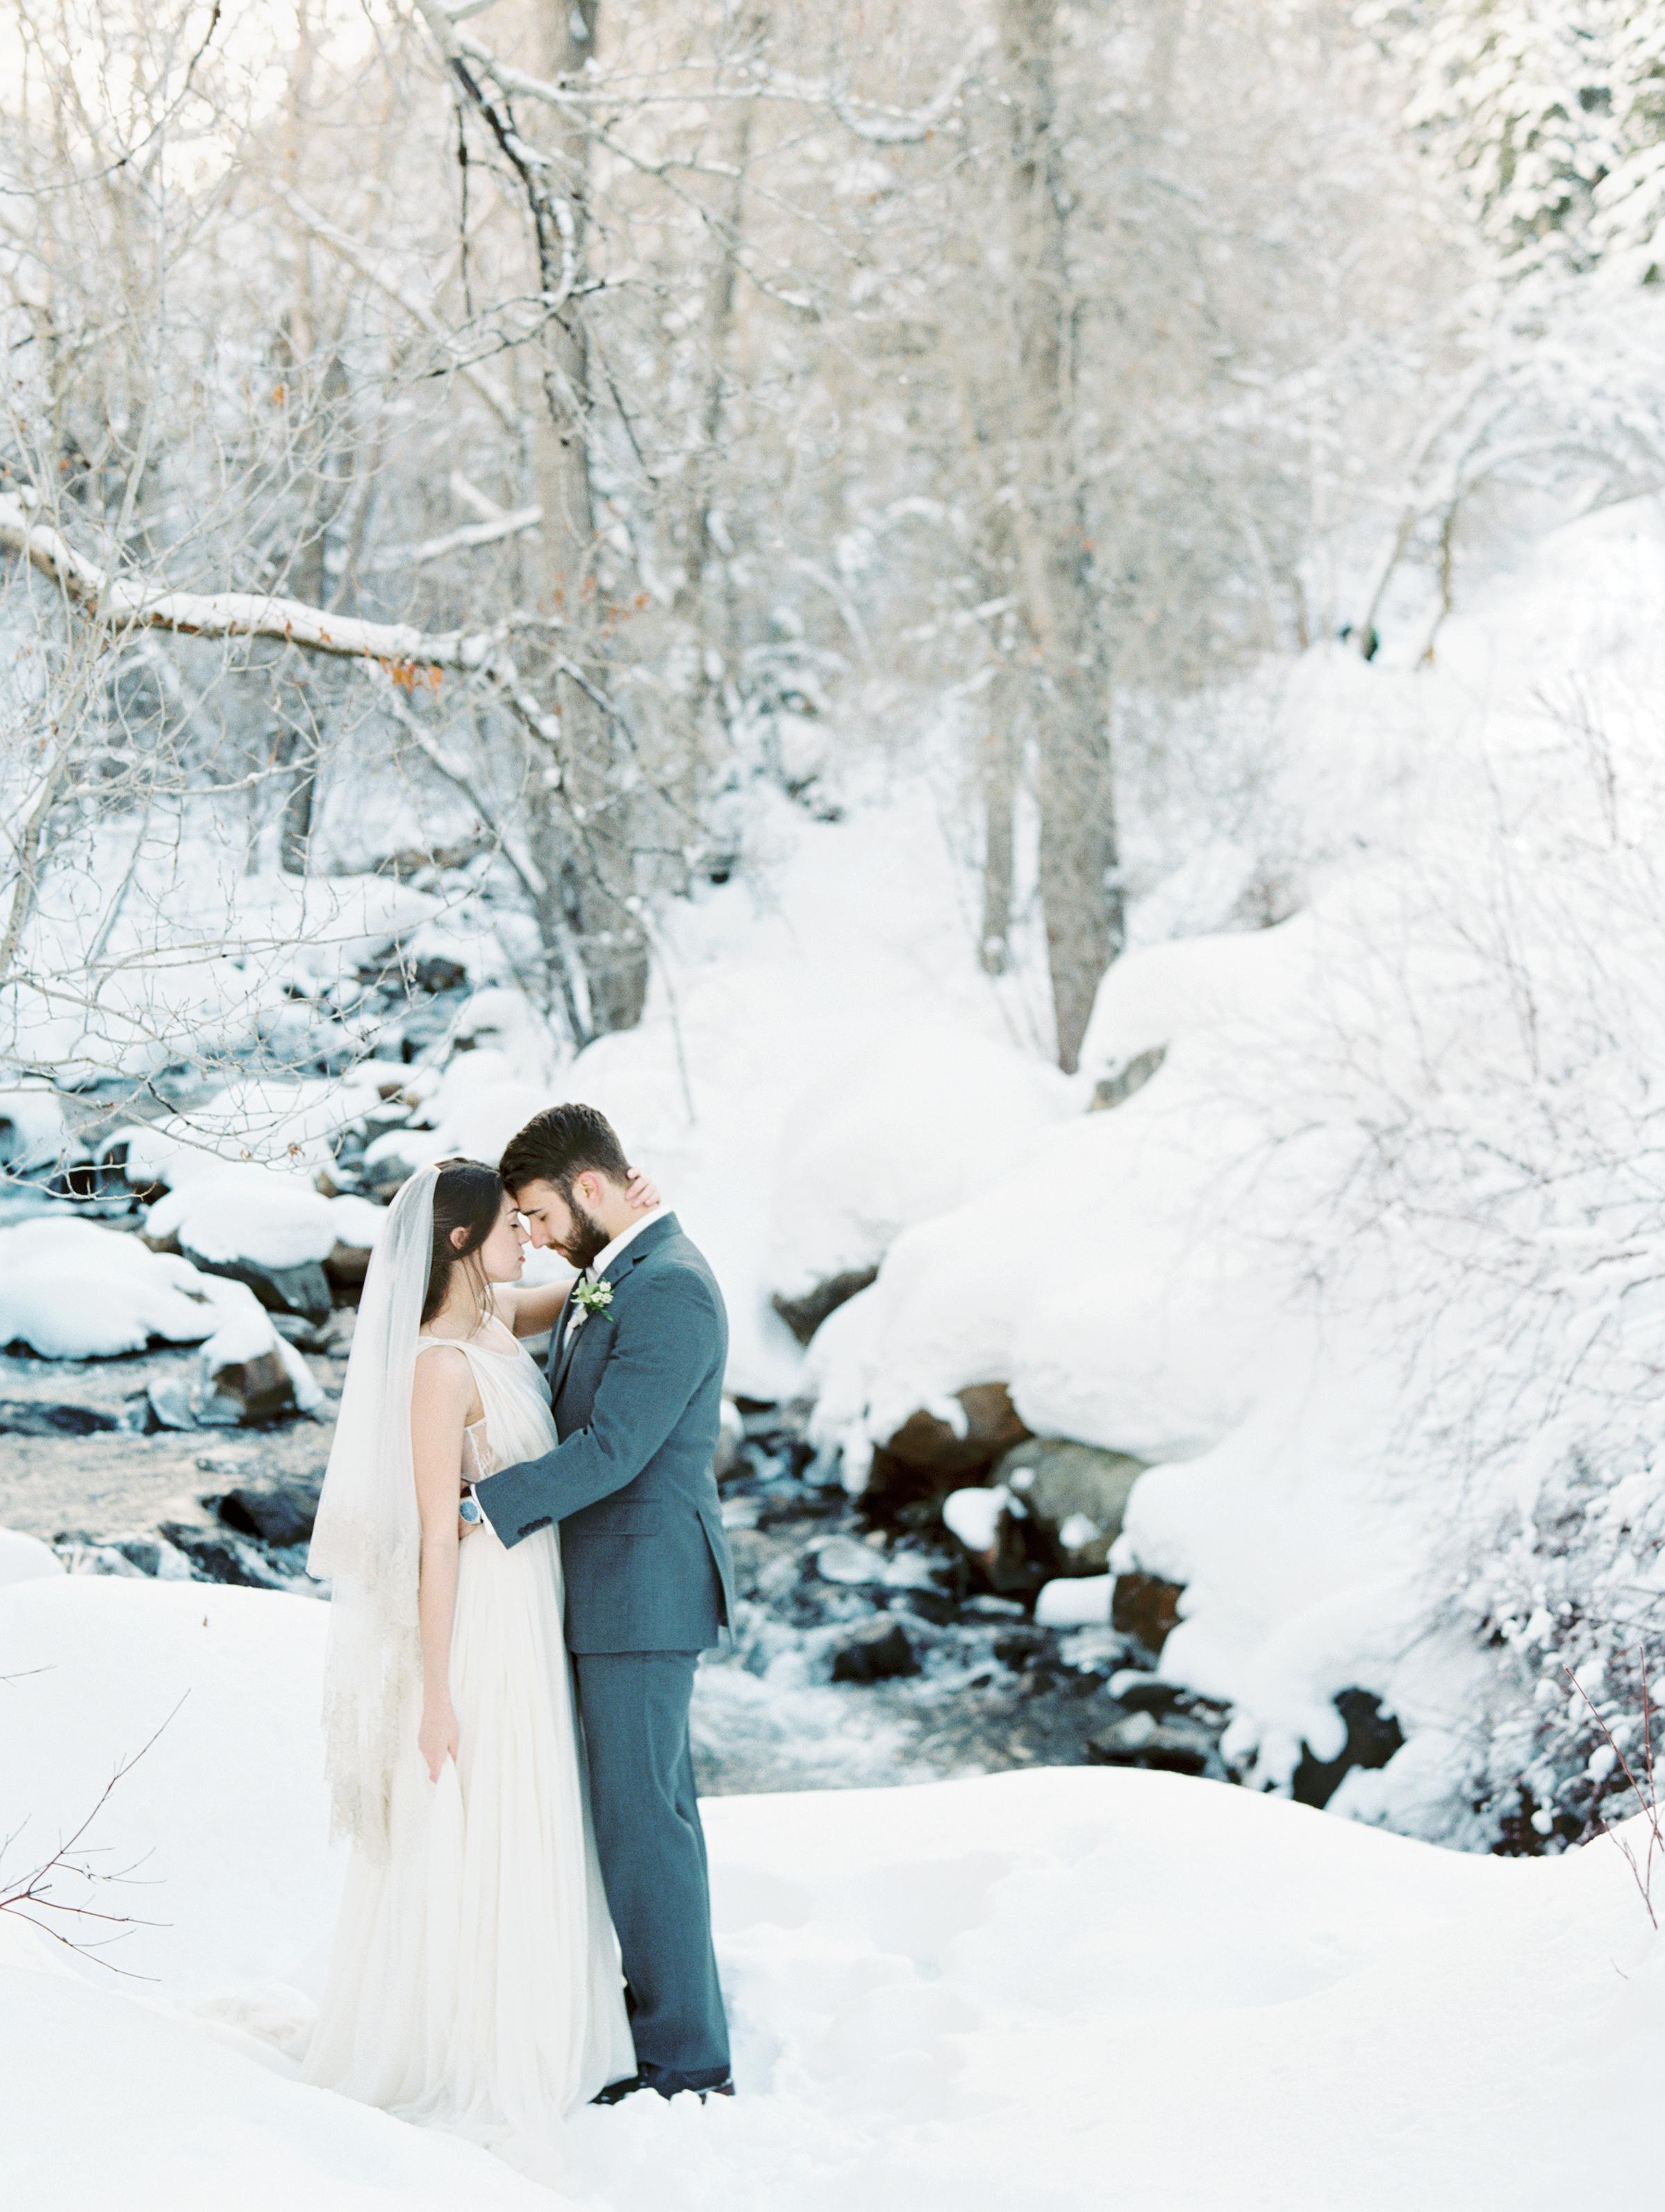 BellaCosa_WinterWonderland-104.jpg